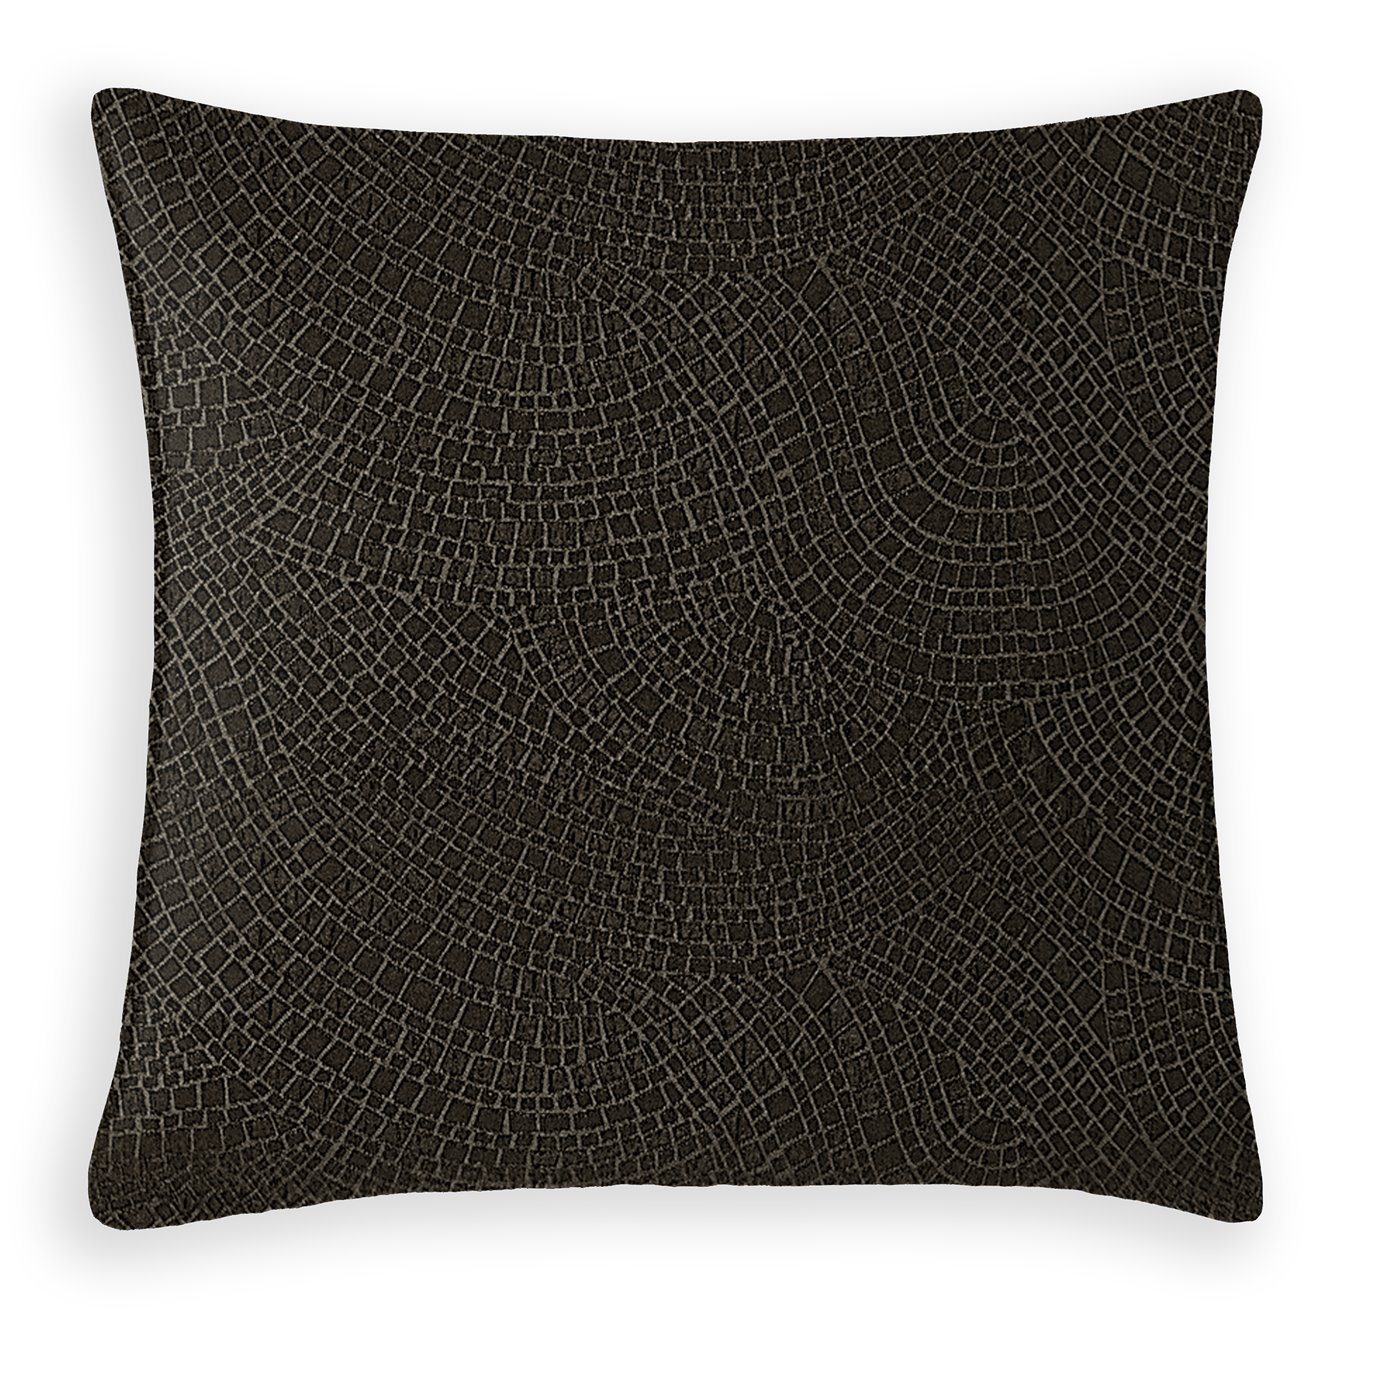 Hickory Lane Decorative Cushion - 18 Inch Square